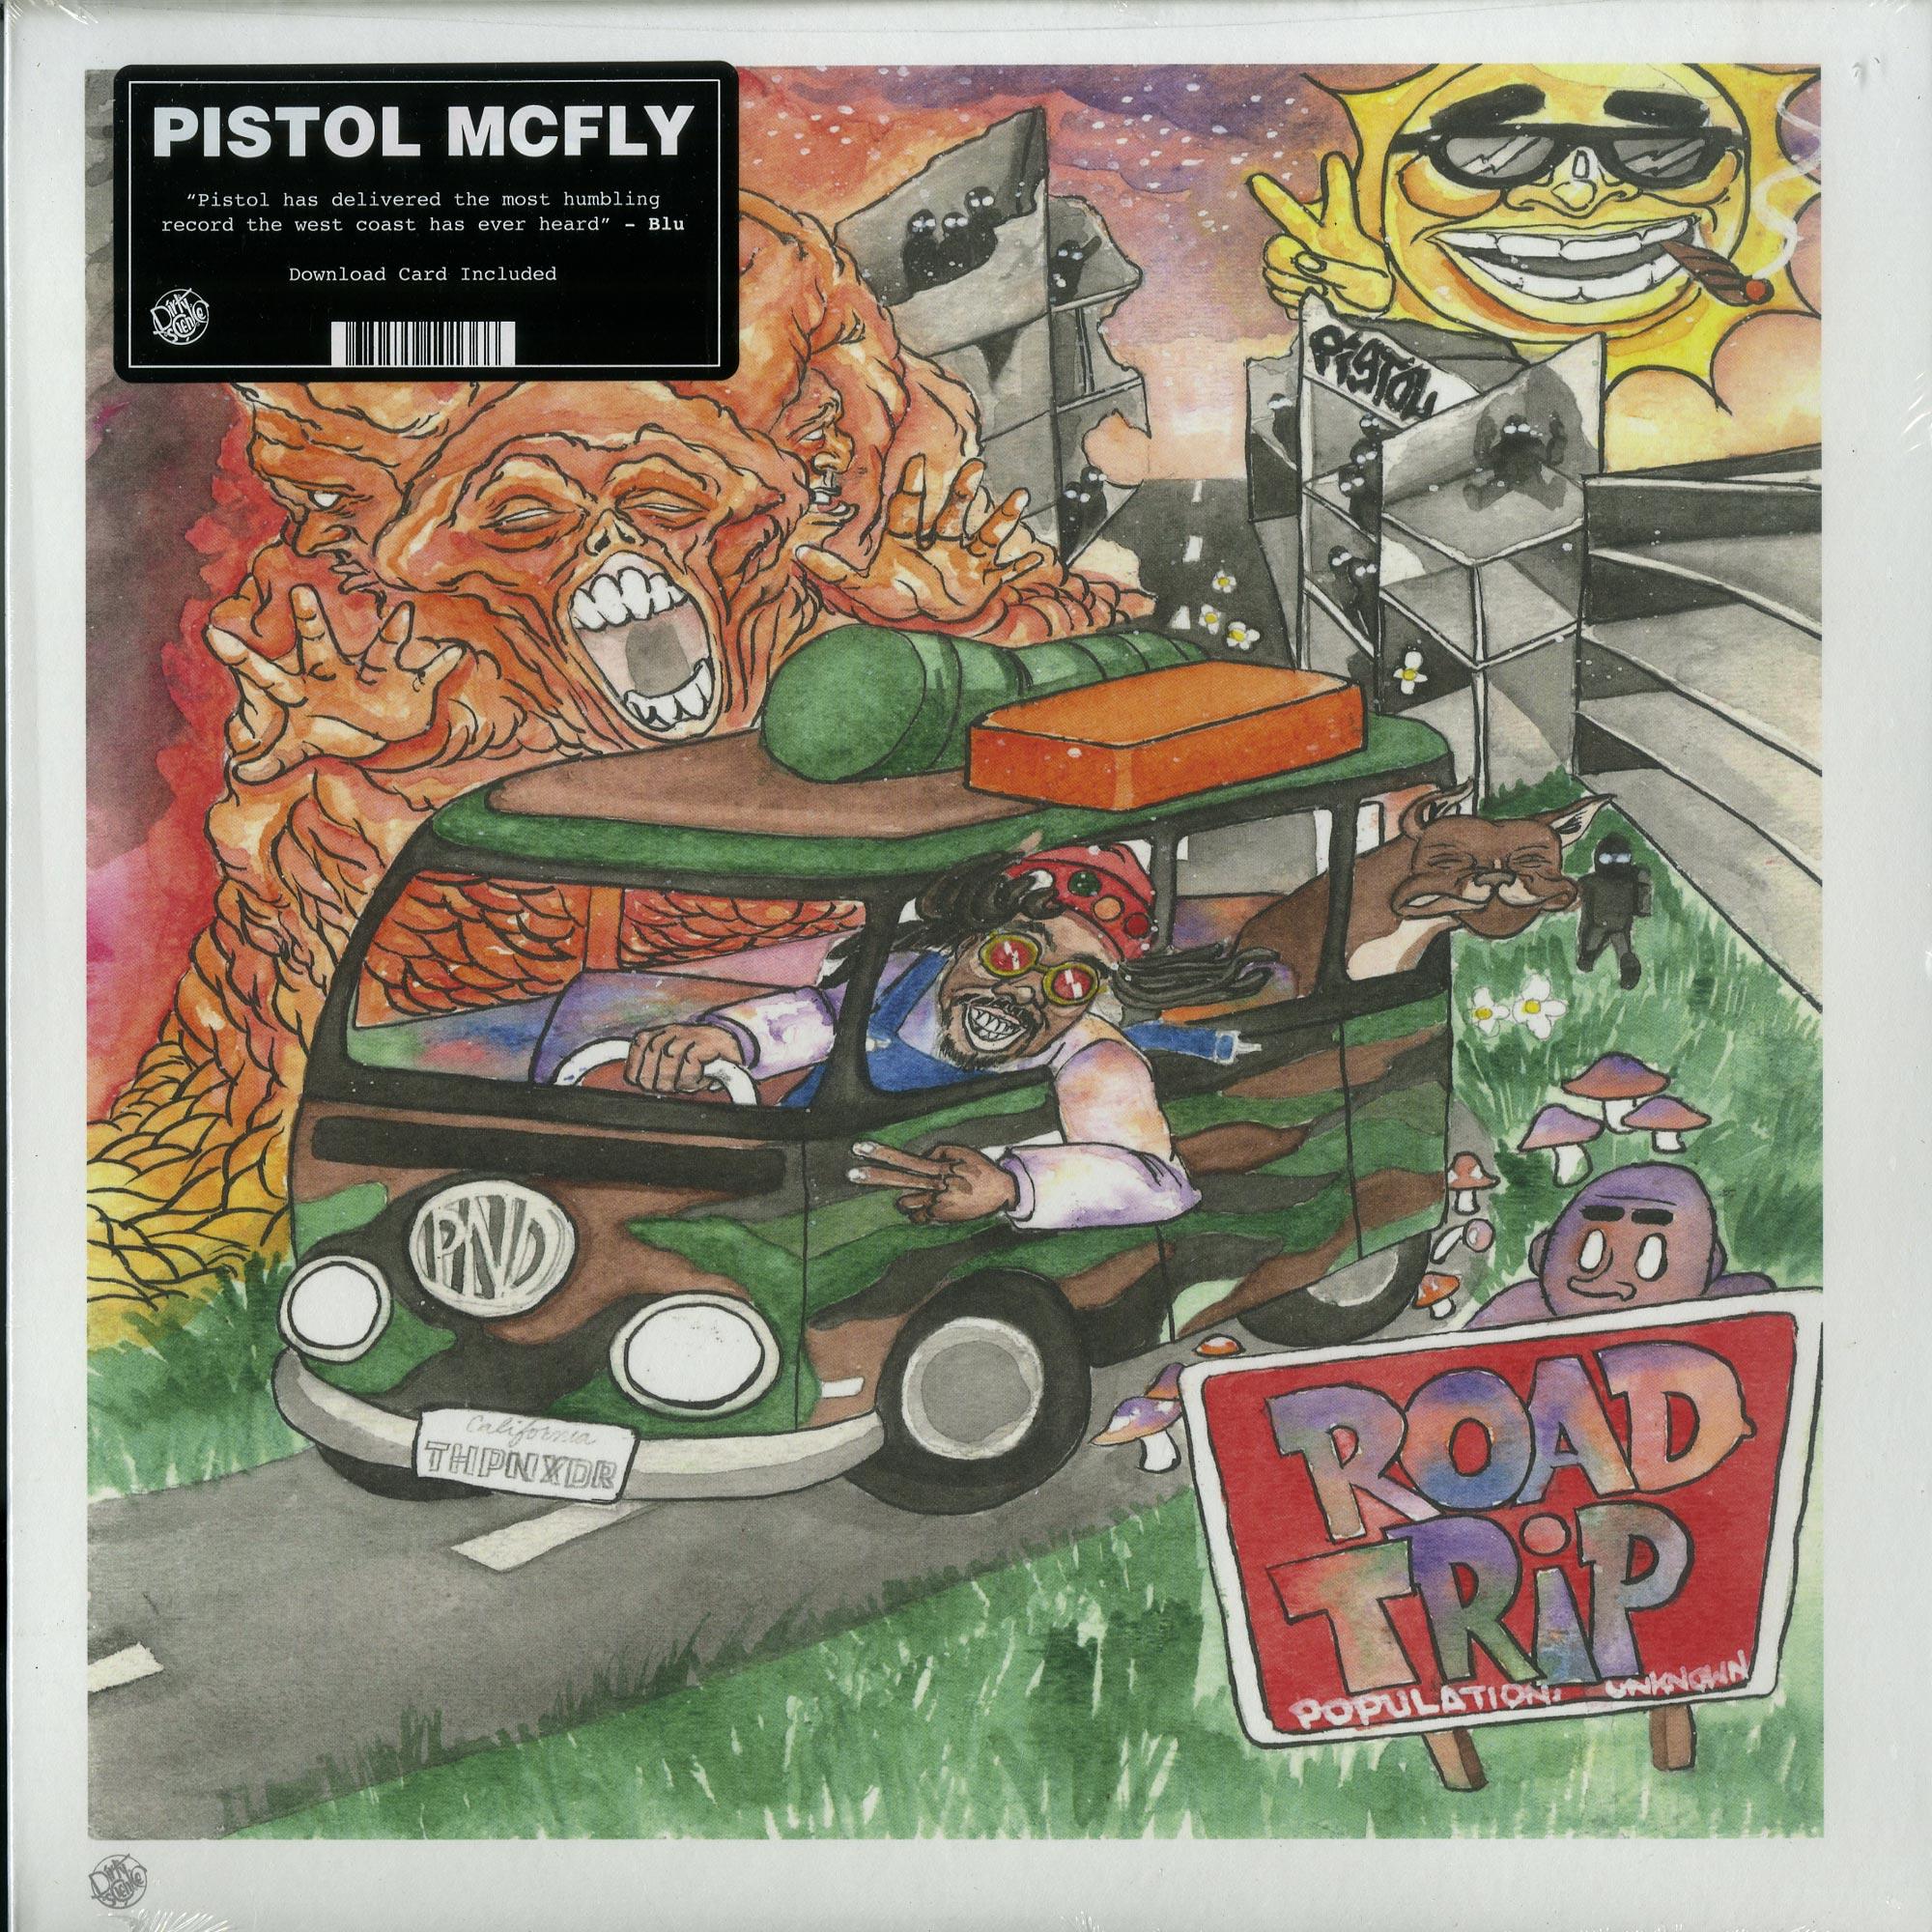 Pistol McFly - ROAD TRIP